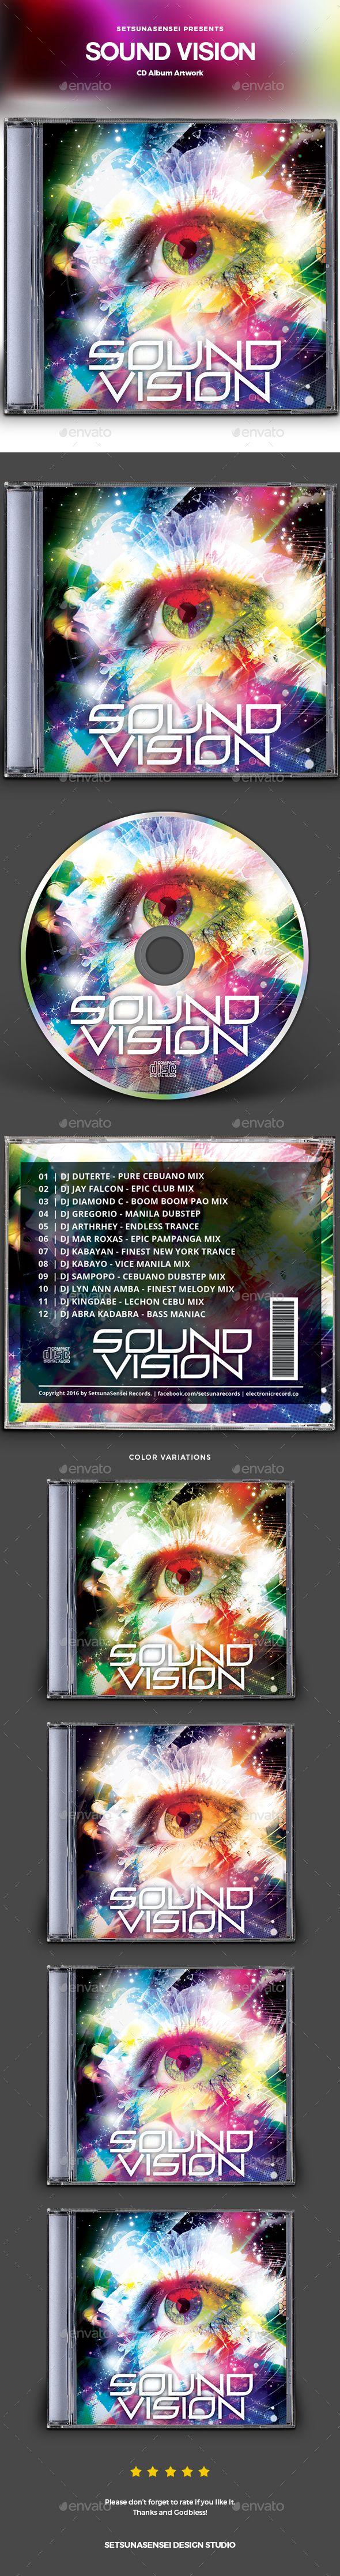 #Sound Vision CD Album Artwork - #CD & #DVD Artwork Print Templates